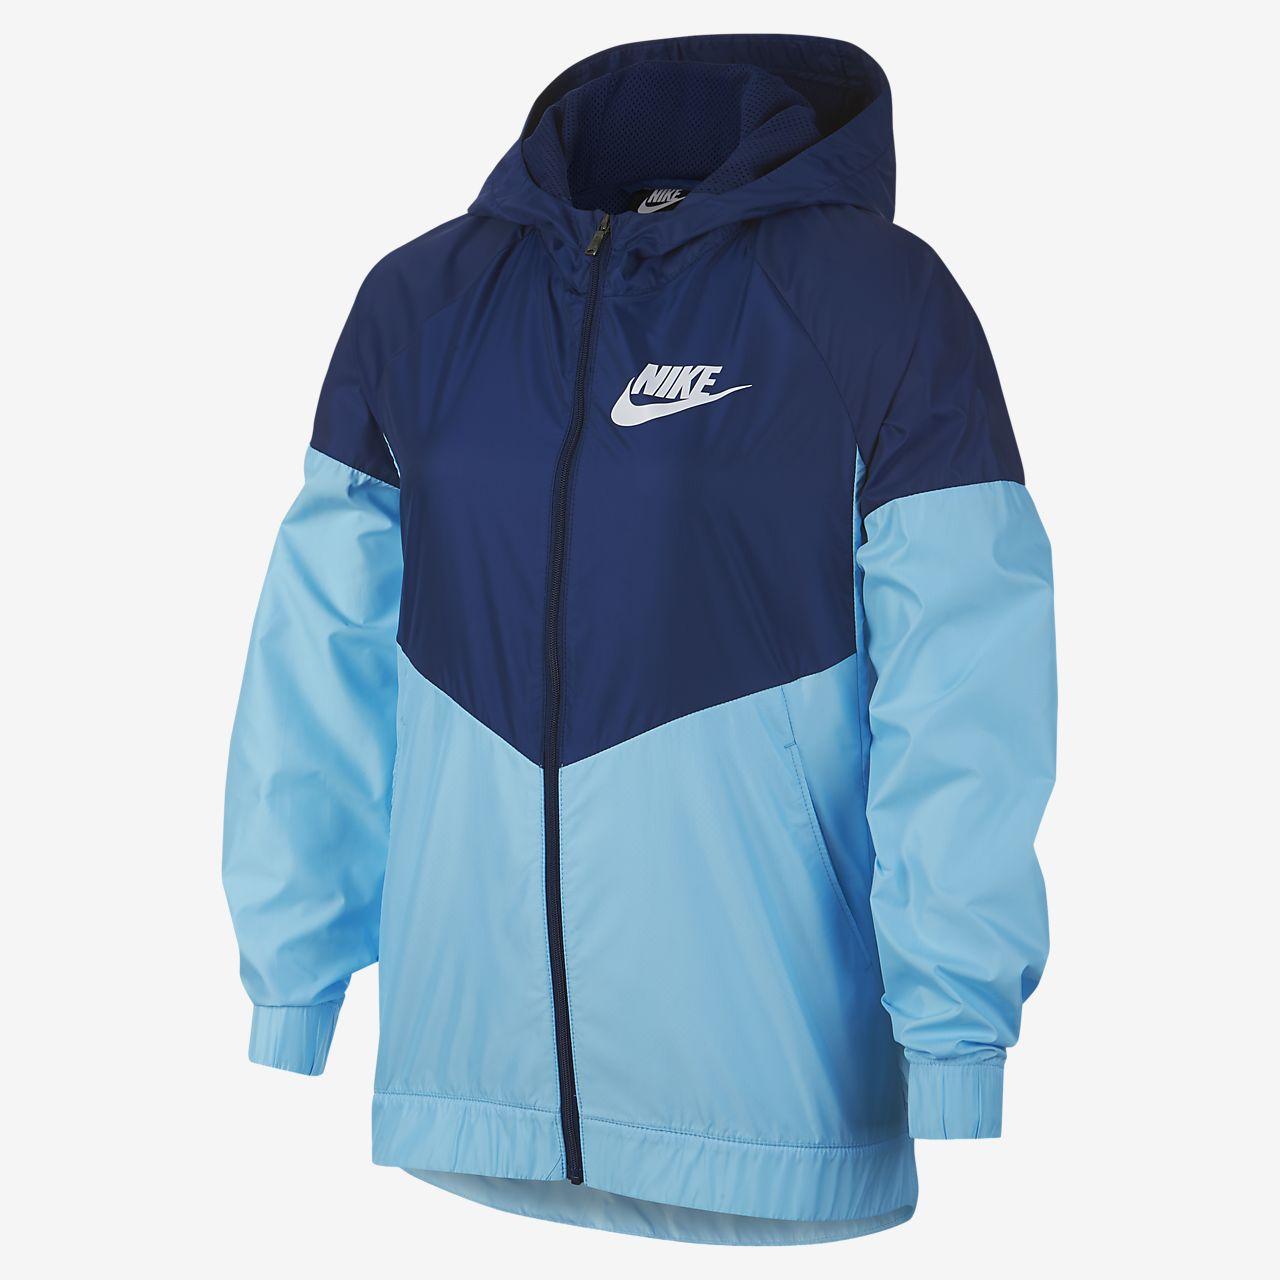 Nike Ch Giacca Ragazza Windrunner Sportswear danzxrnIR